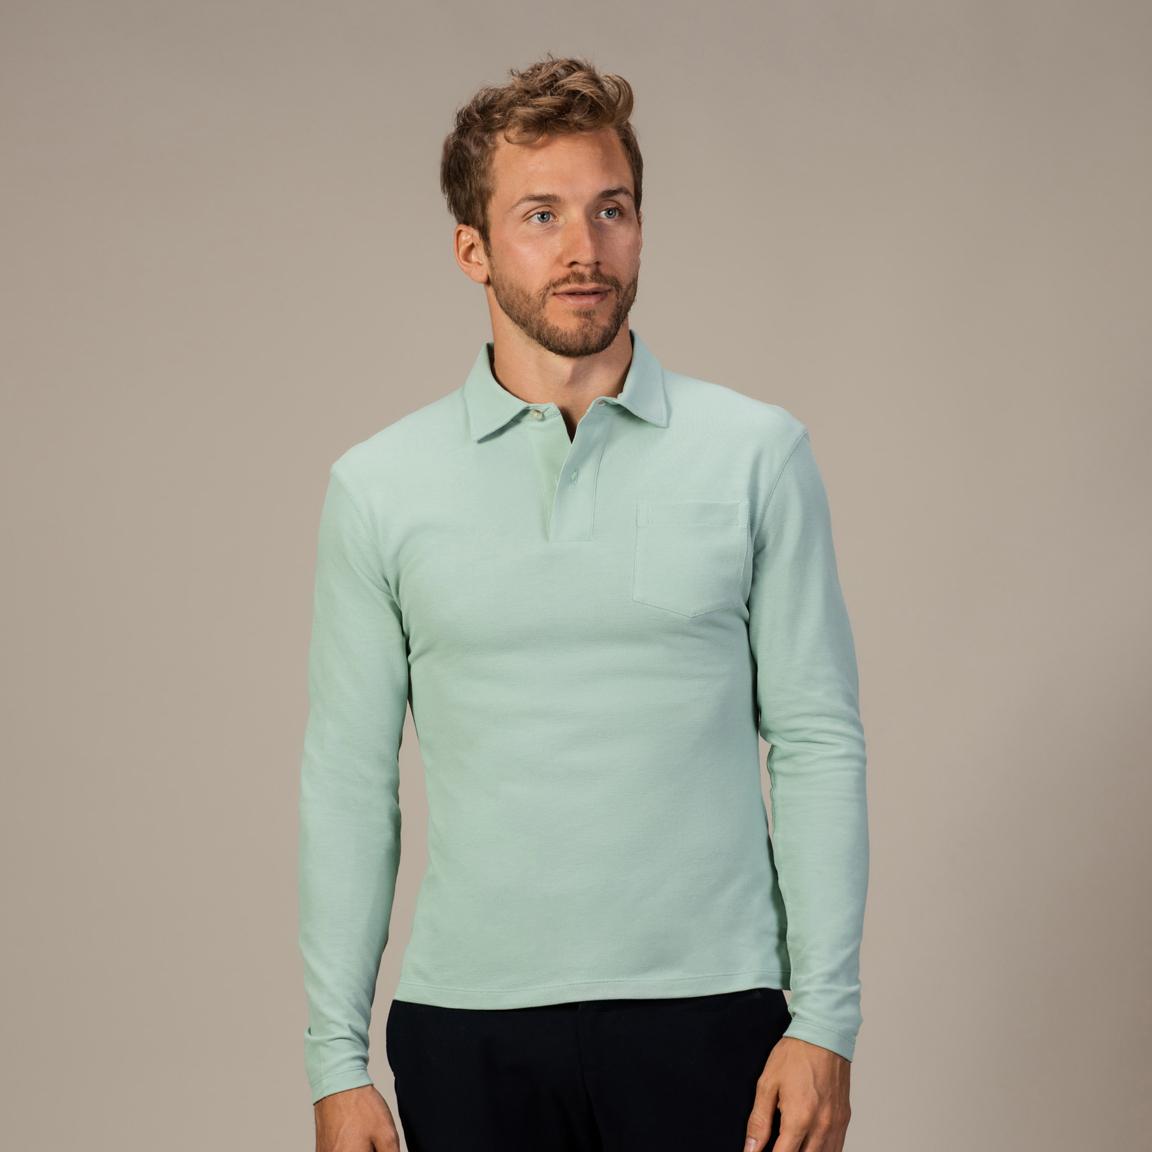 Pistachio long-sleeved polo shirt